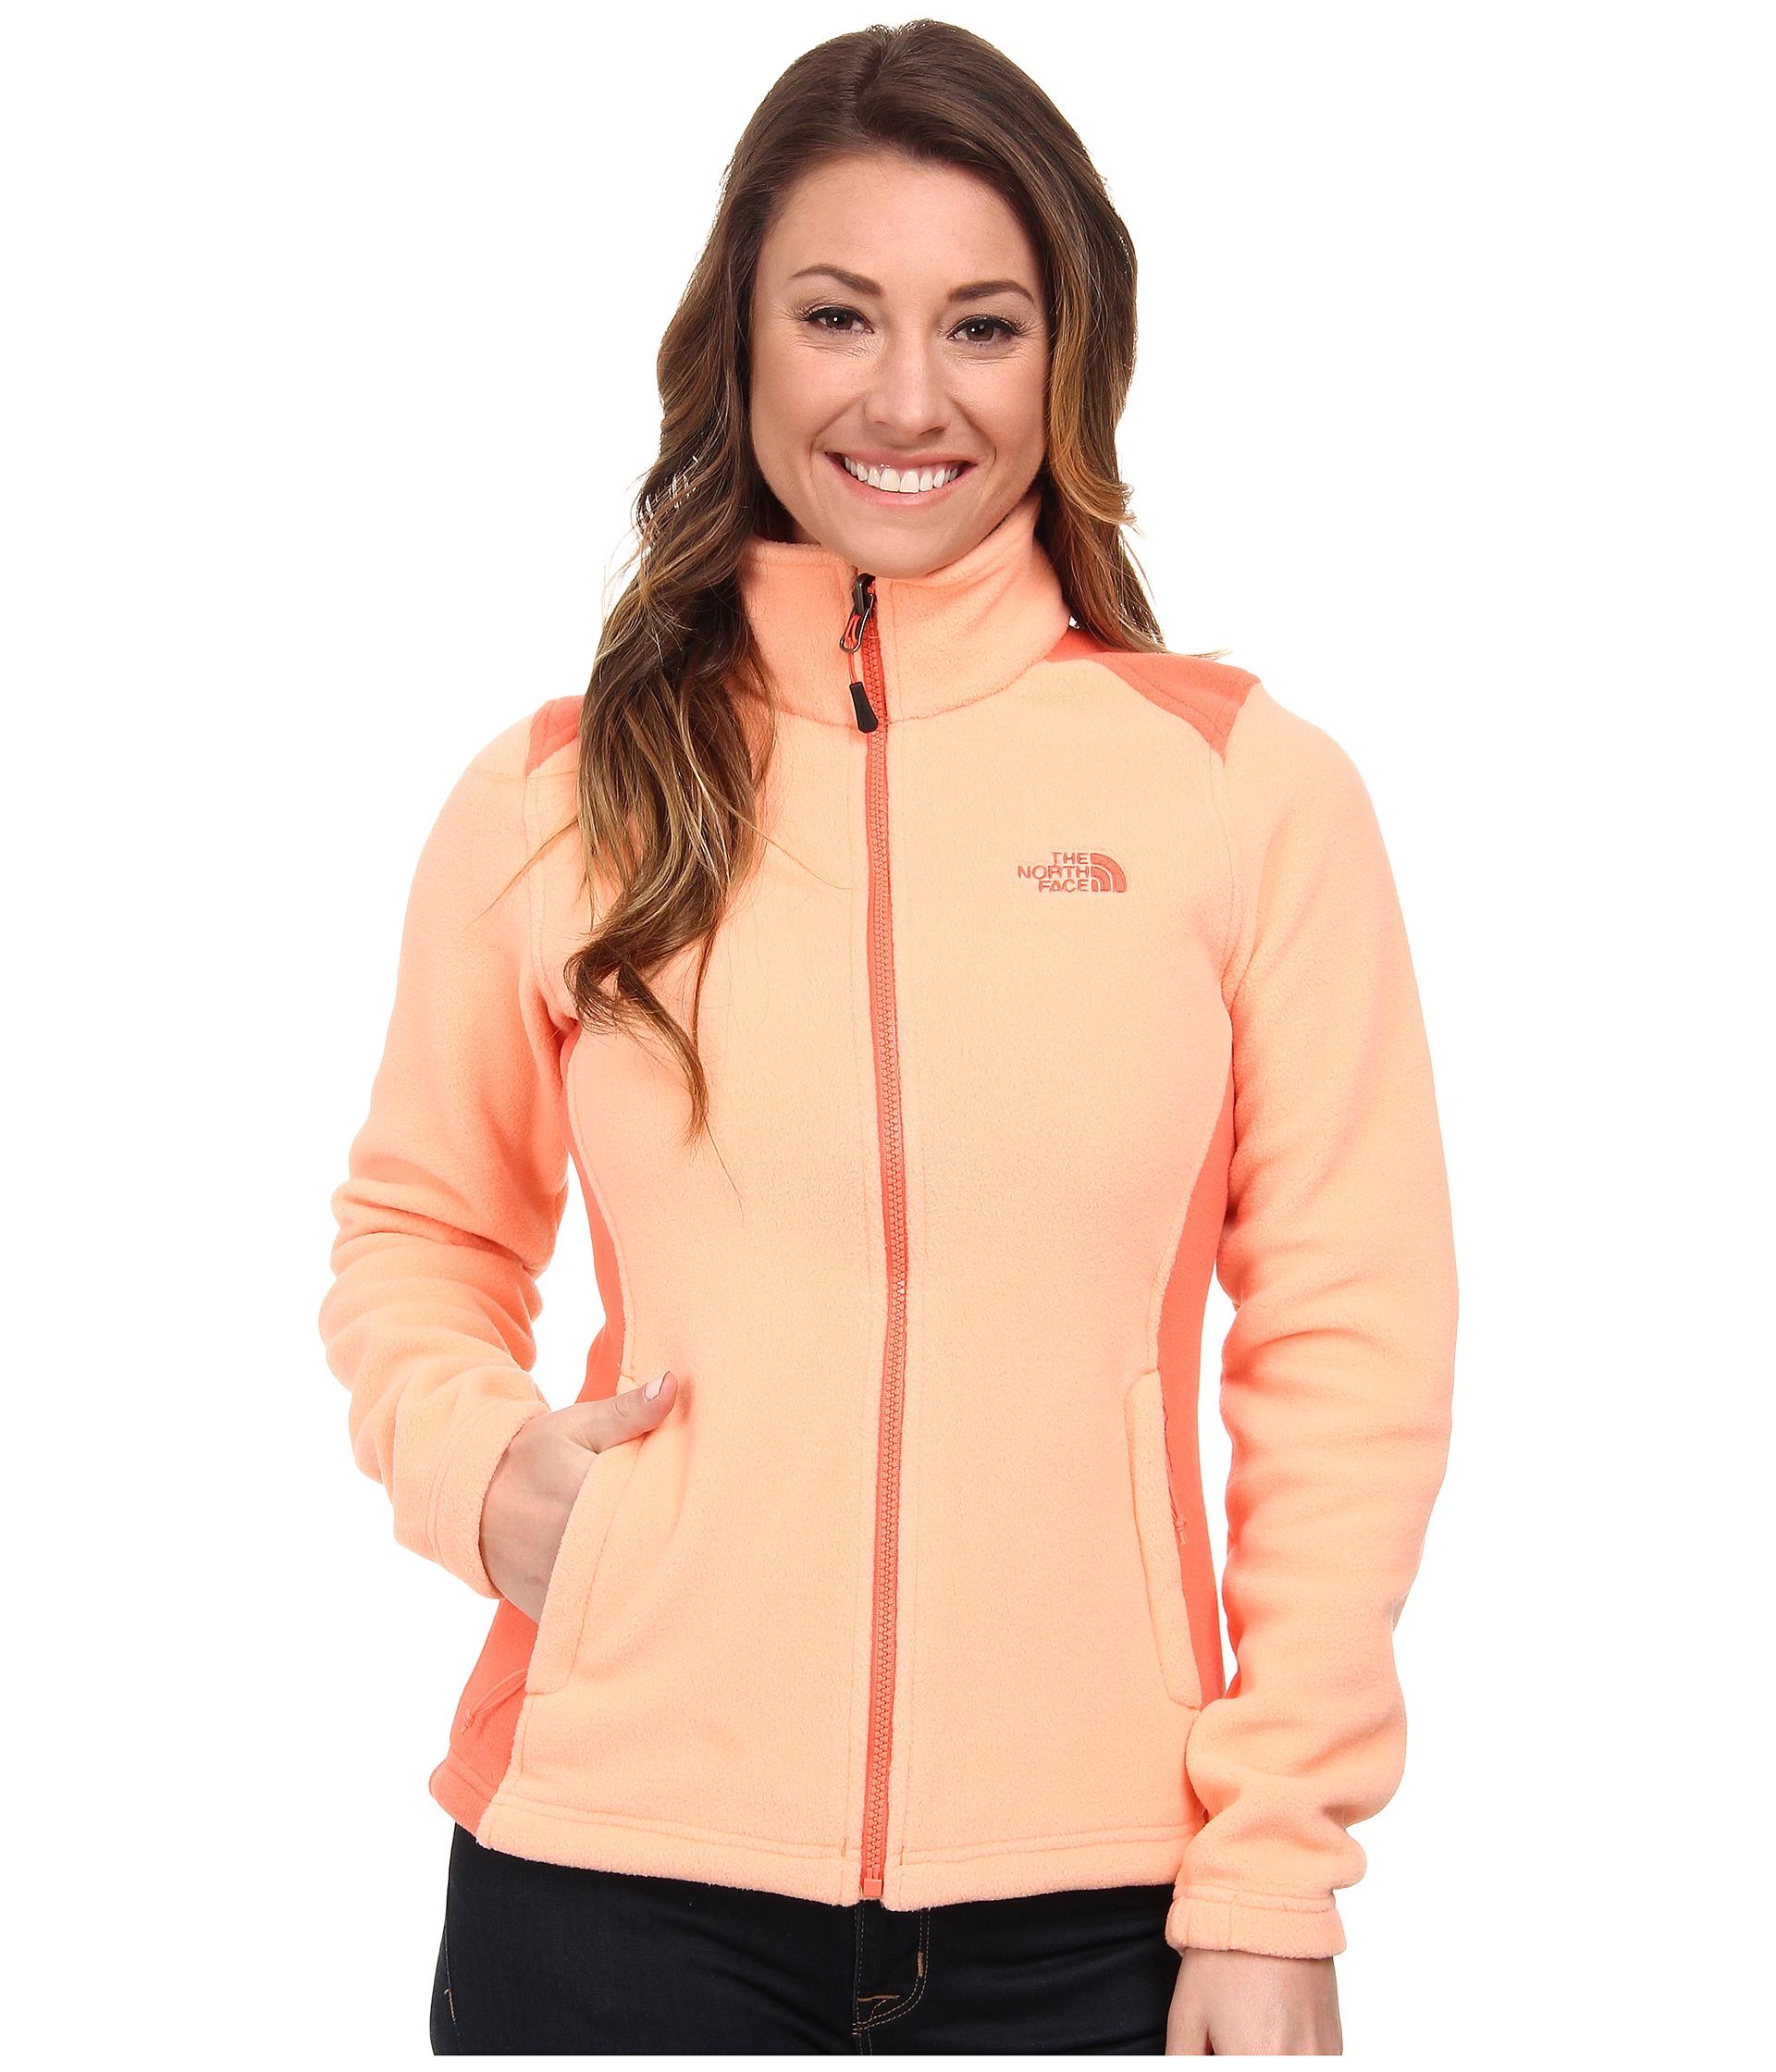 lyst the north face khumbu 2 jacket in orange rh lyst com